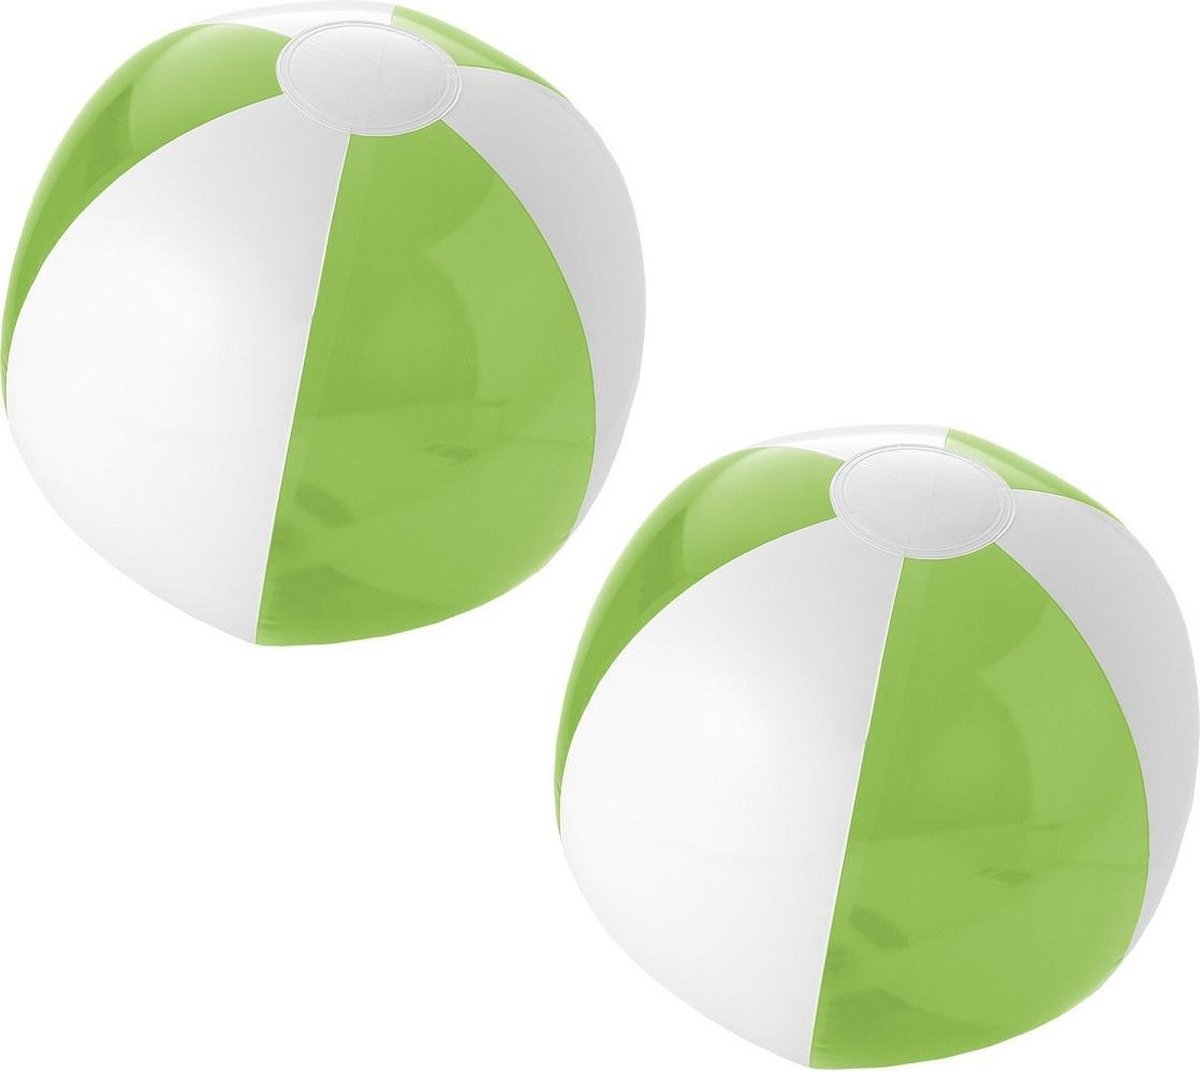 3x stuks opblaasbare strandballen groen/wit 30 cm - Buitenspeelgoed waterspeelgoed opblaasbaar